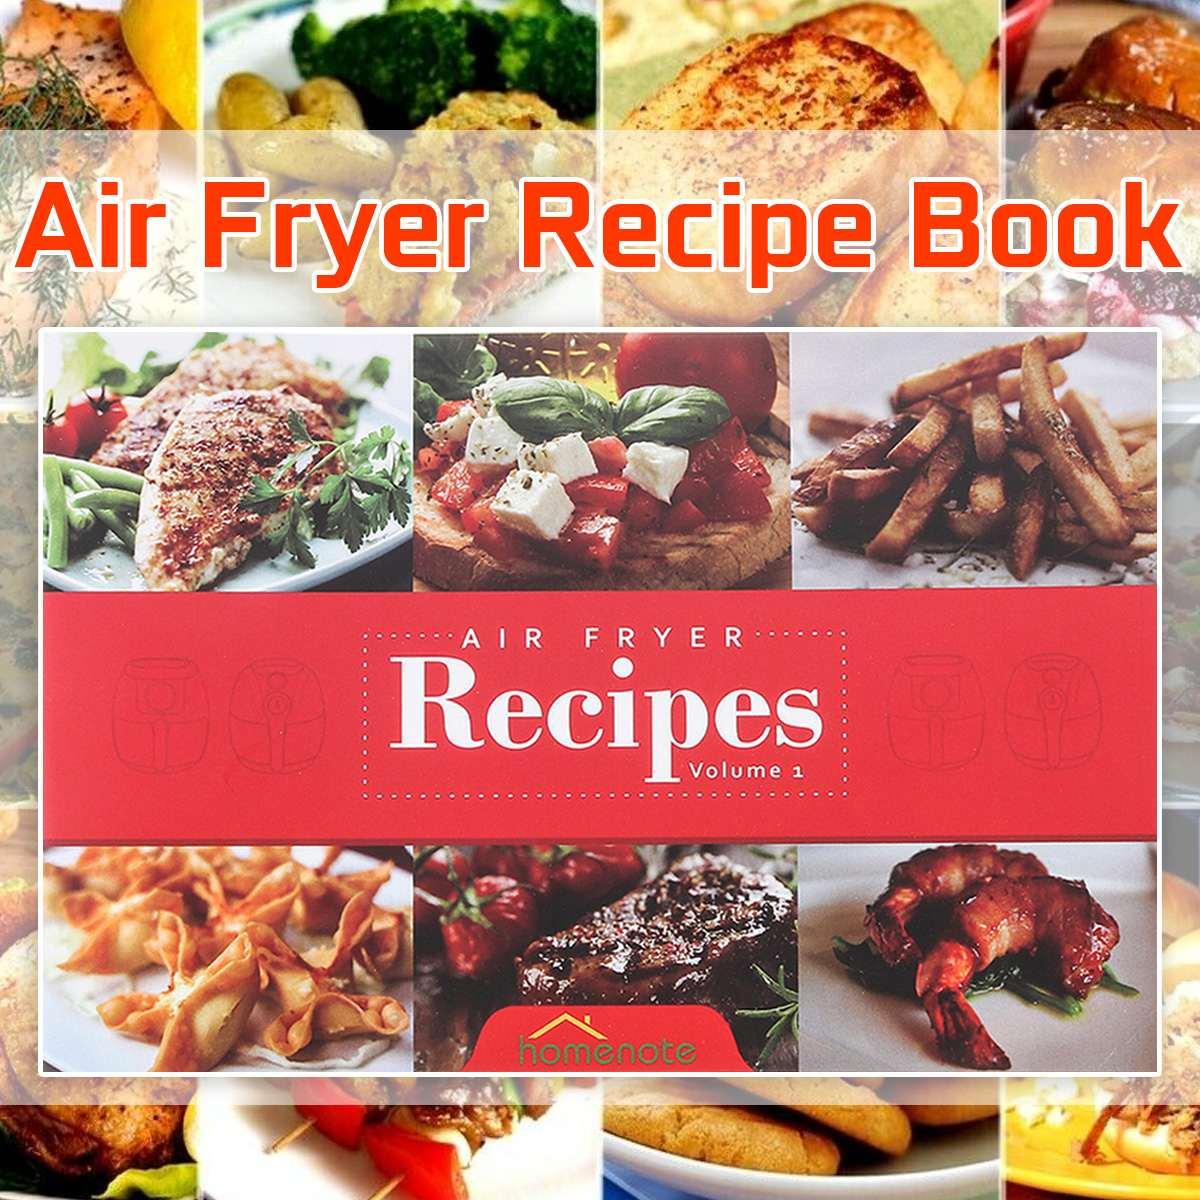 Farbe druck Air Friteuse Cookbook Air Friteuse Rezept Buch Rezept Buch Mit 15 Köstliche Mahlzeiten Englisch Sprache Kochbuch